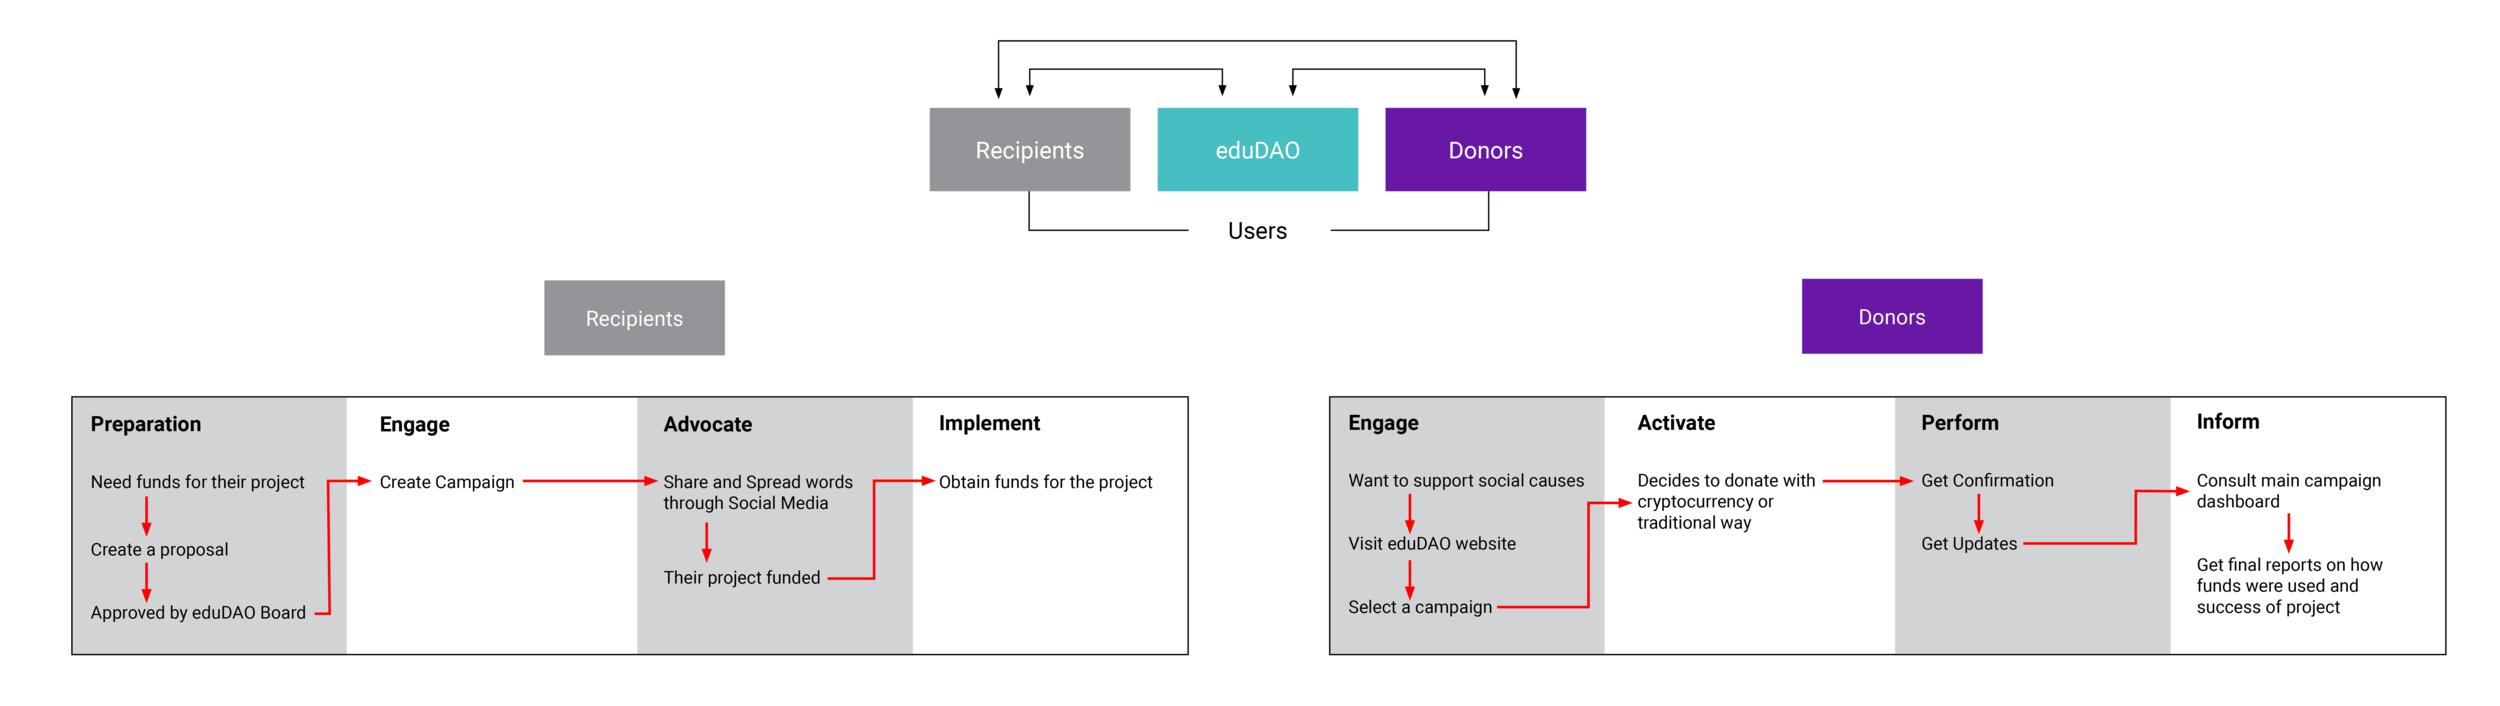 eduDAO_structure_flows.png